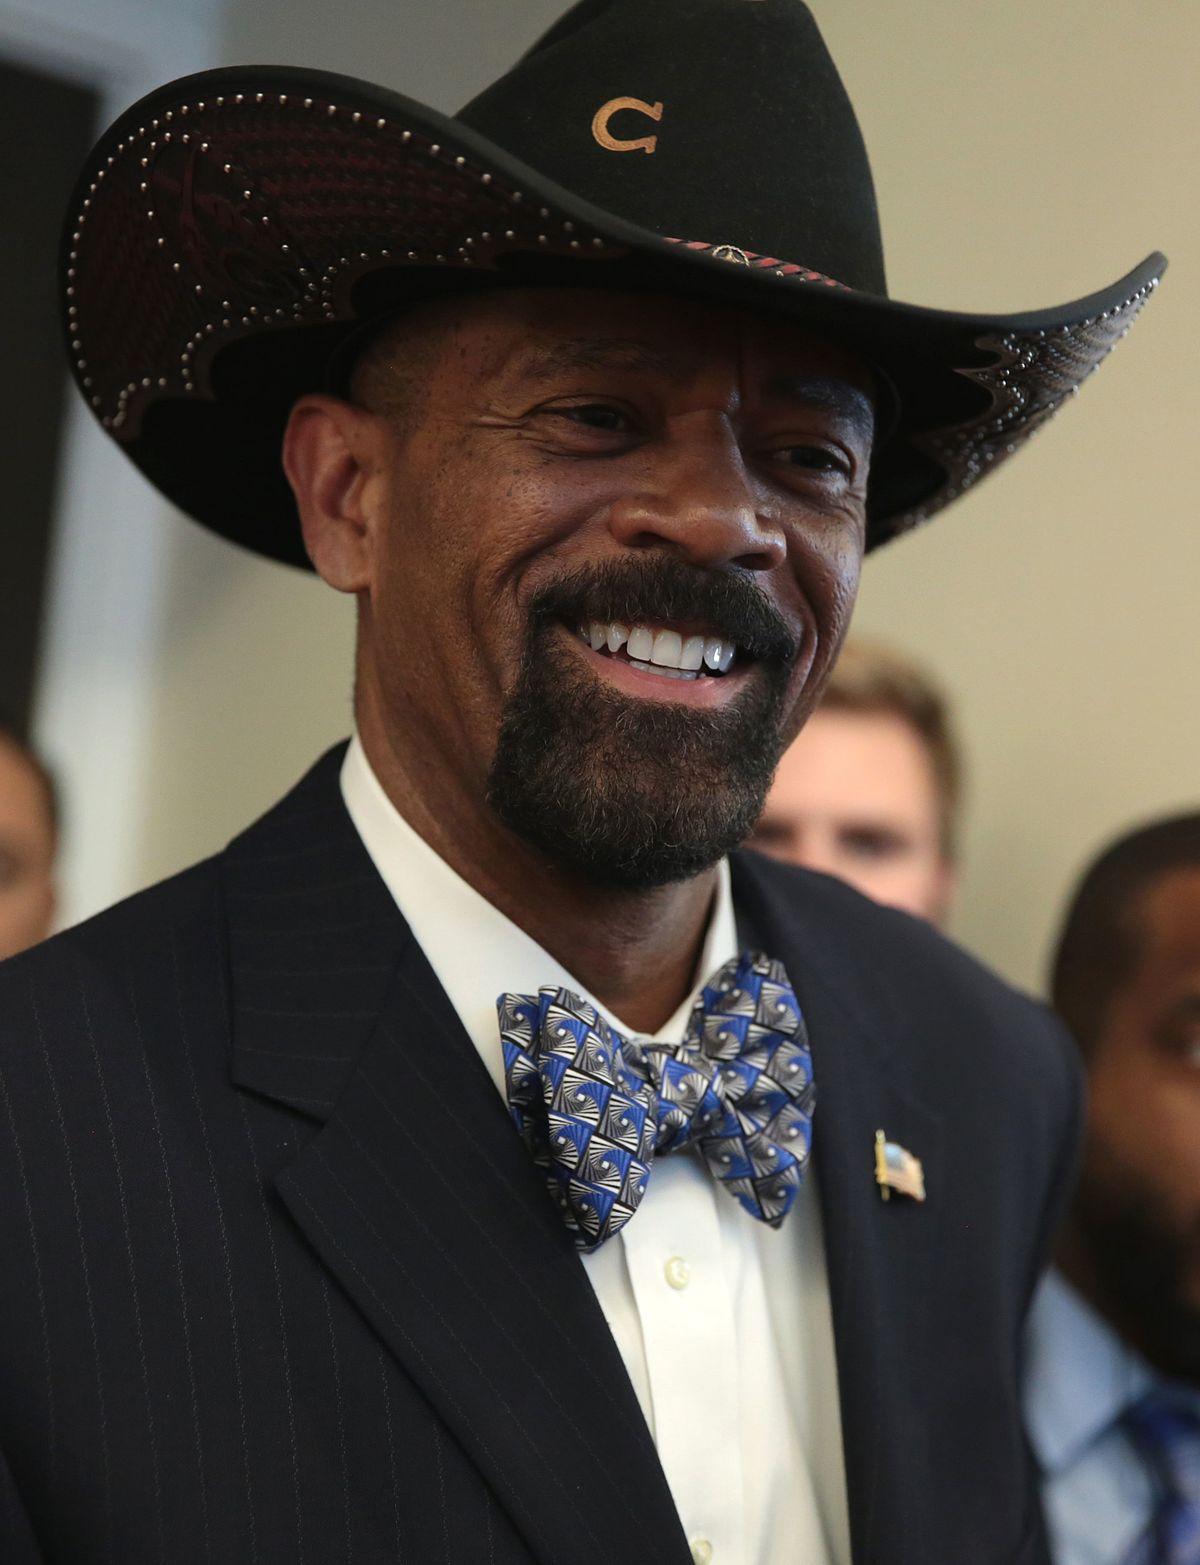 David Clarke Sheriff Wikipedia